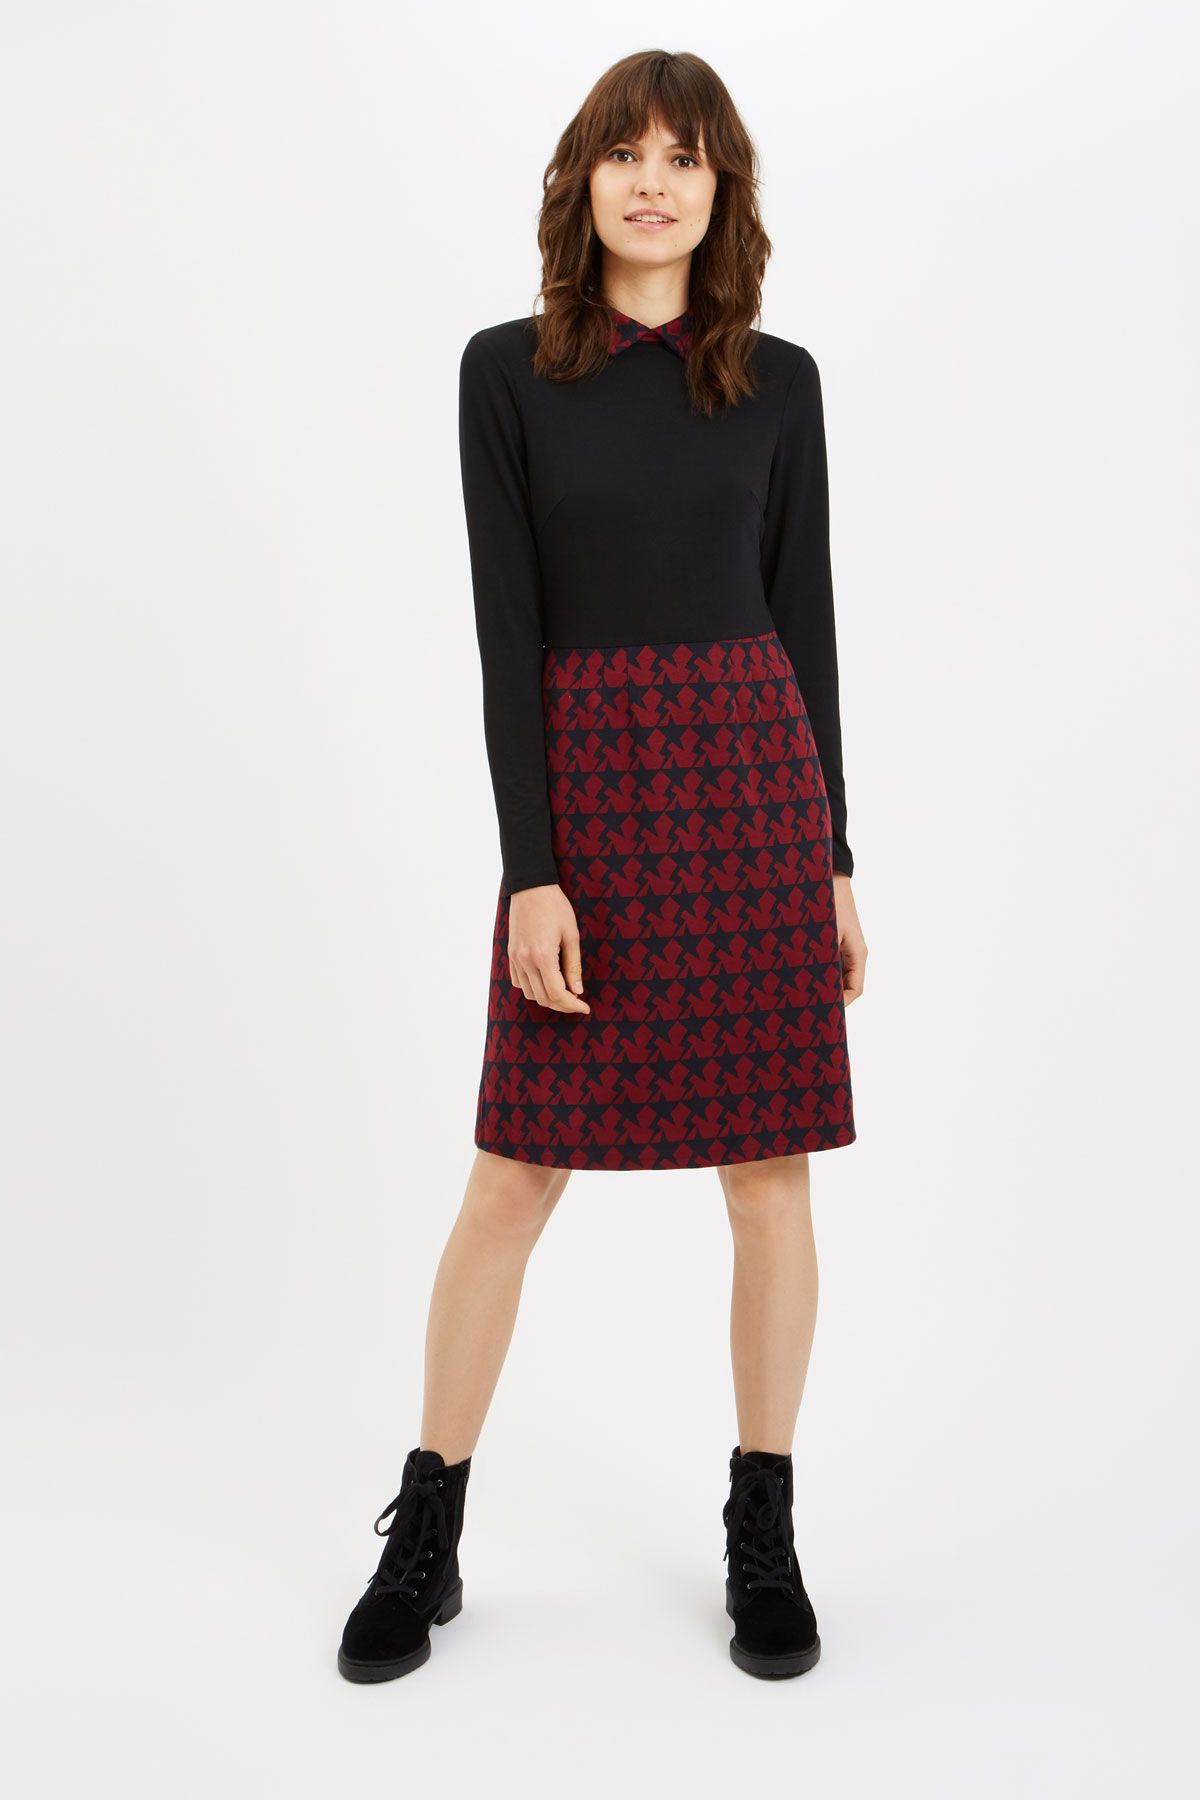 Top N' Tail Mini Long Sleeve Dress in Wine